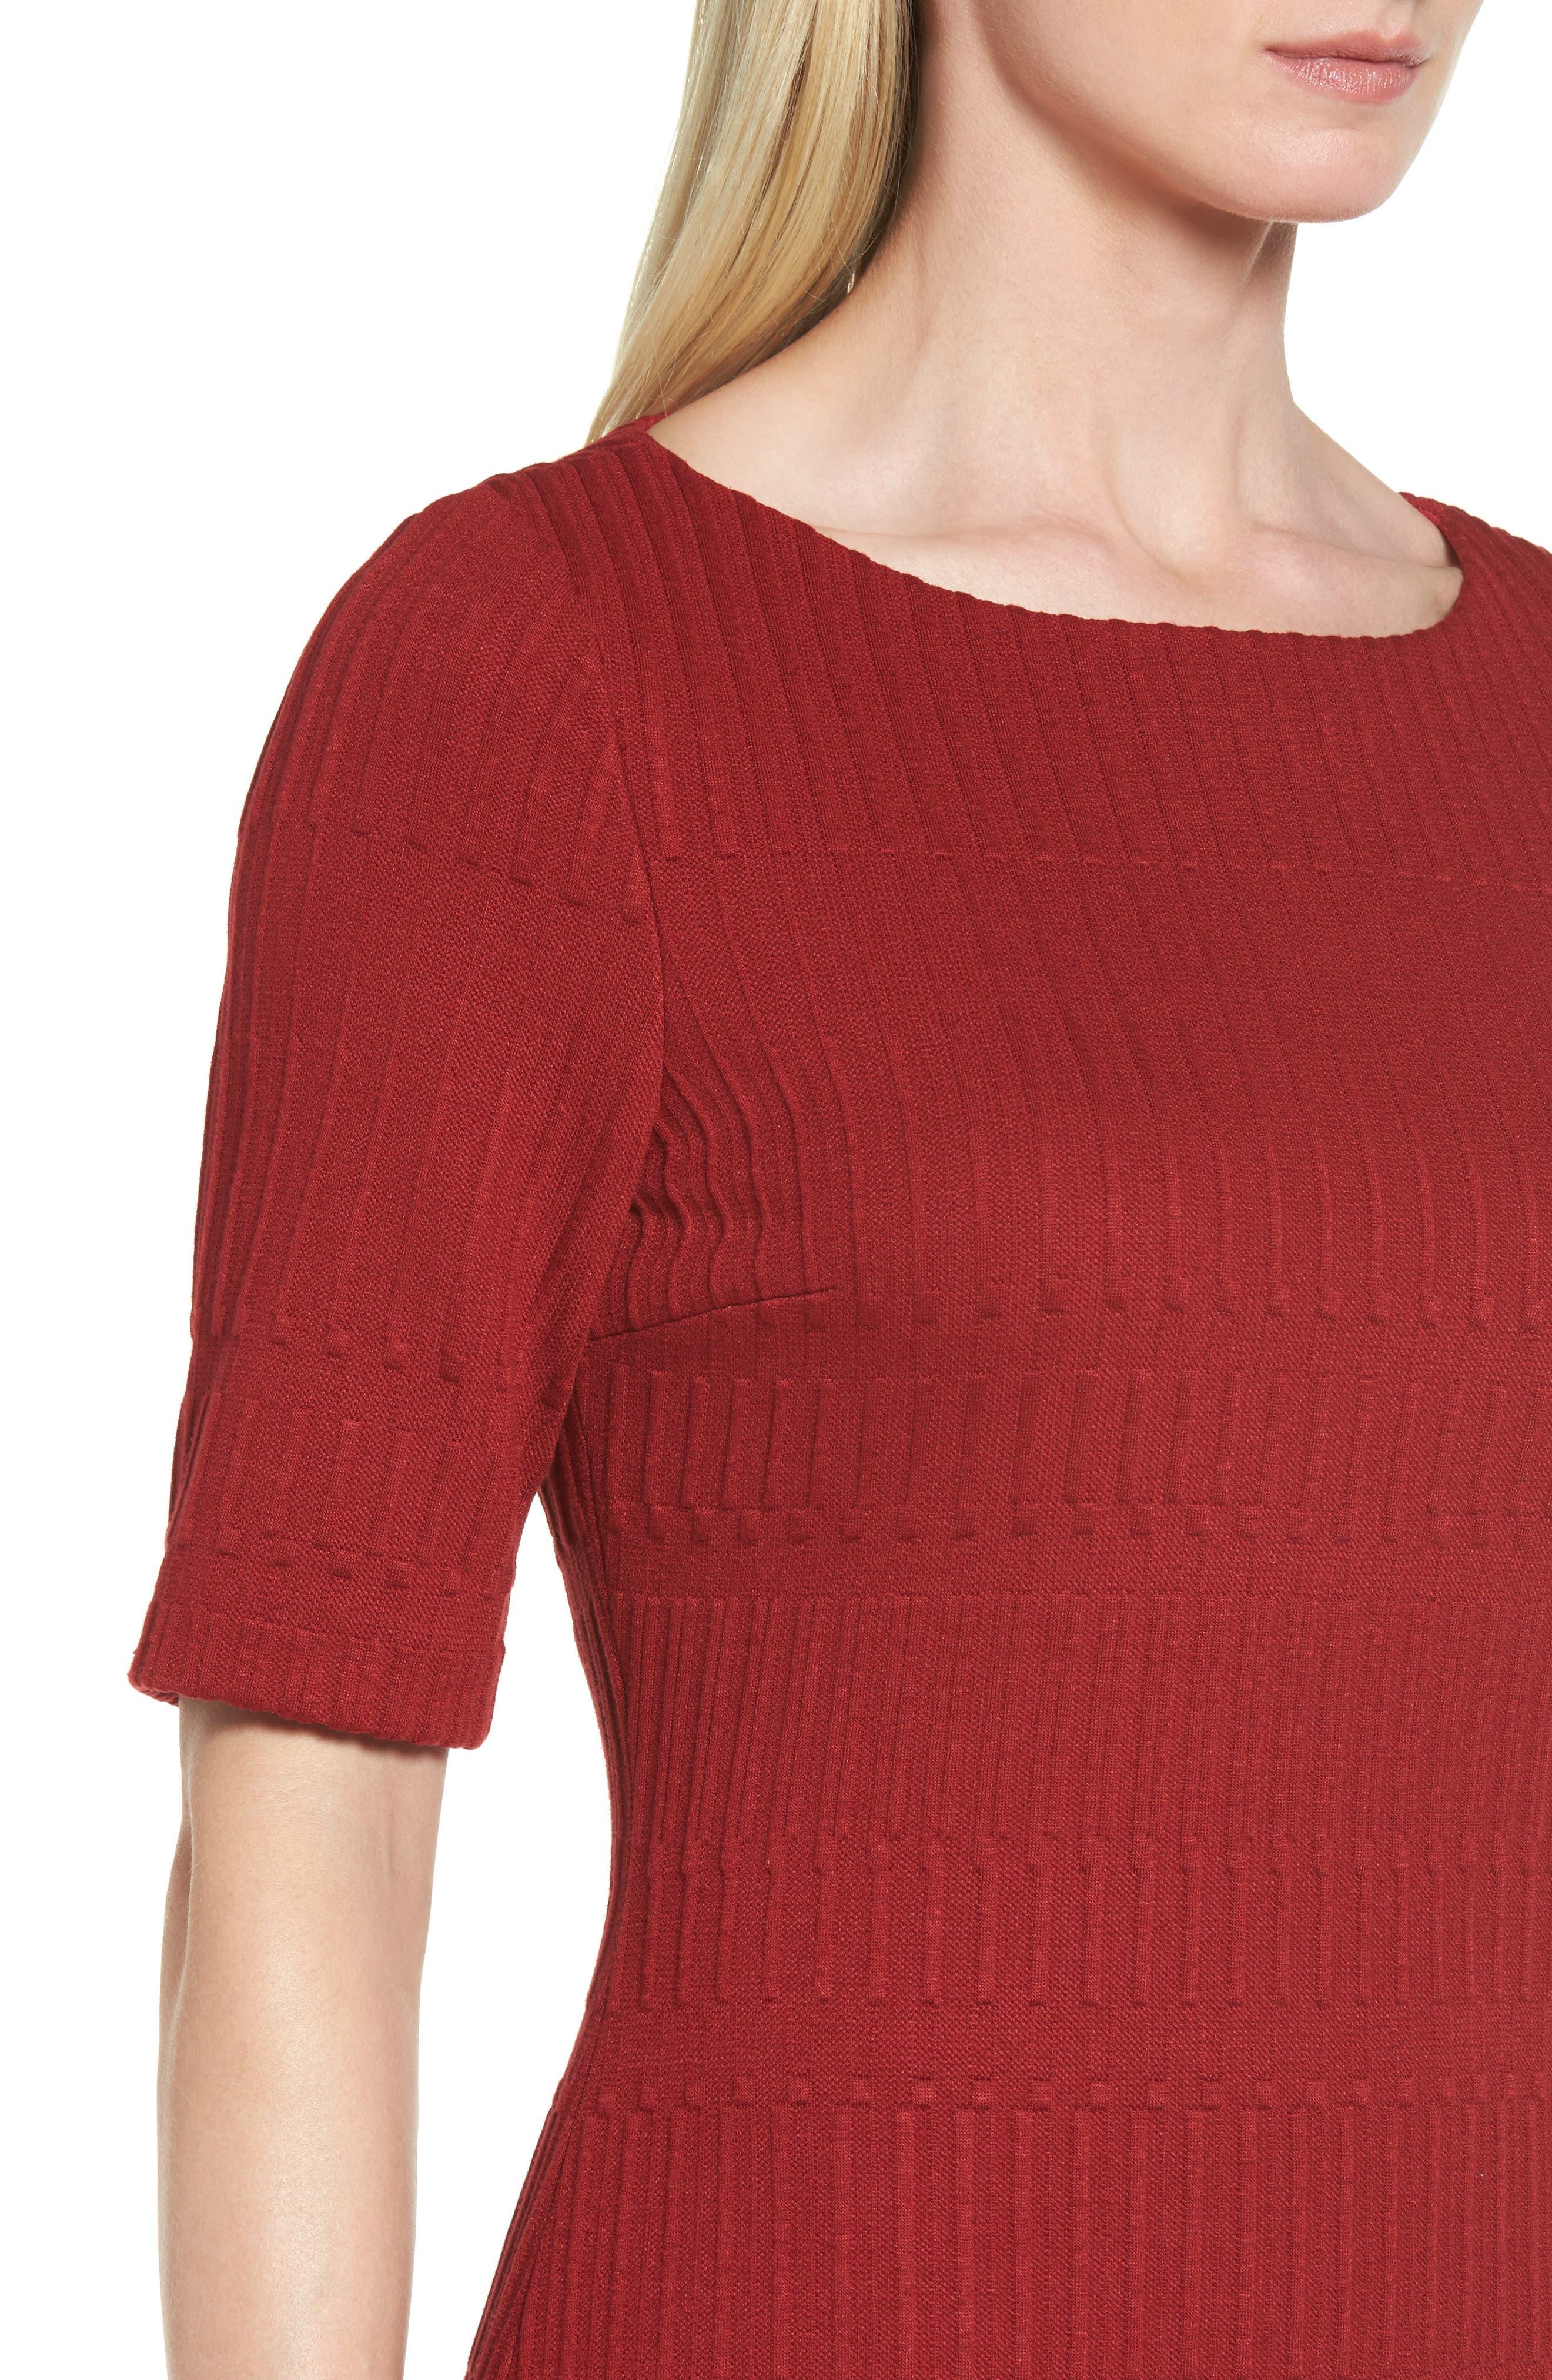 Hadea Knit Sheath Dress,                             Alternate thumbnail 4, color,                             Pomegranate